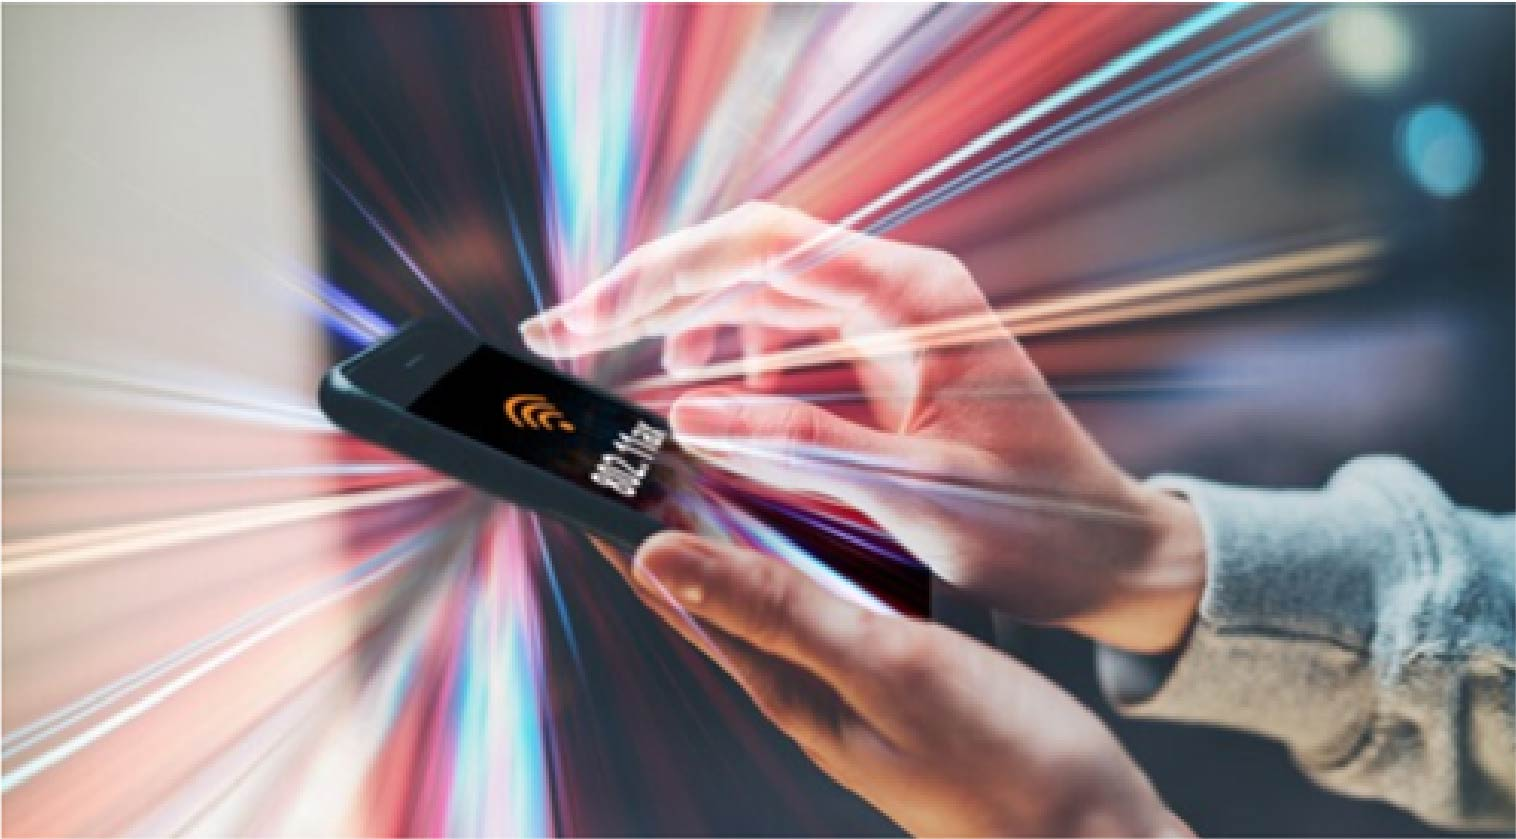 802.11ax – Chuẩn Wi-Fi thế hệ tương lai.